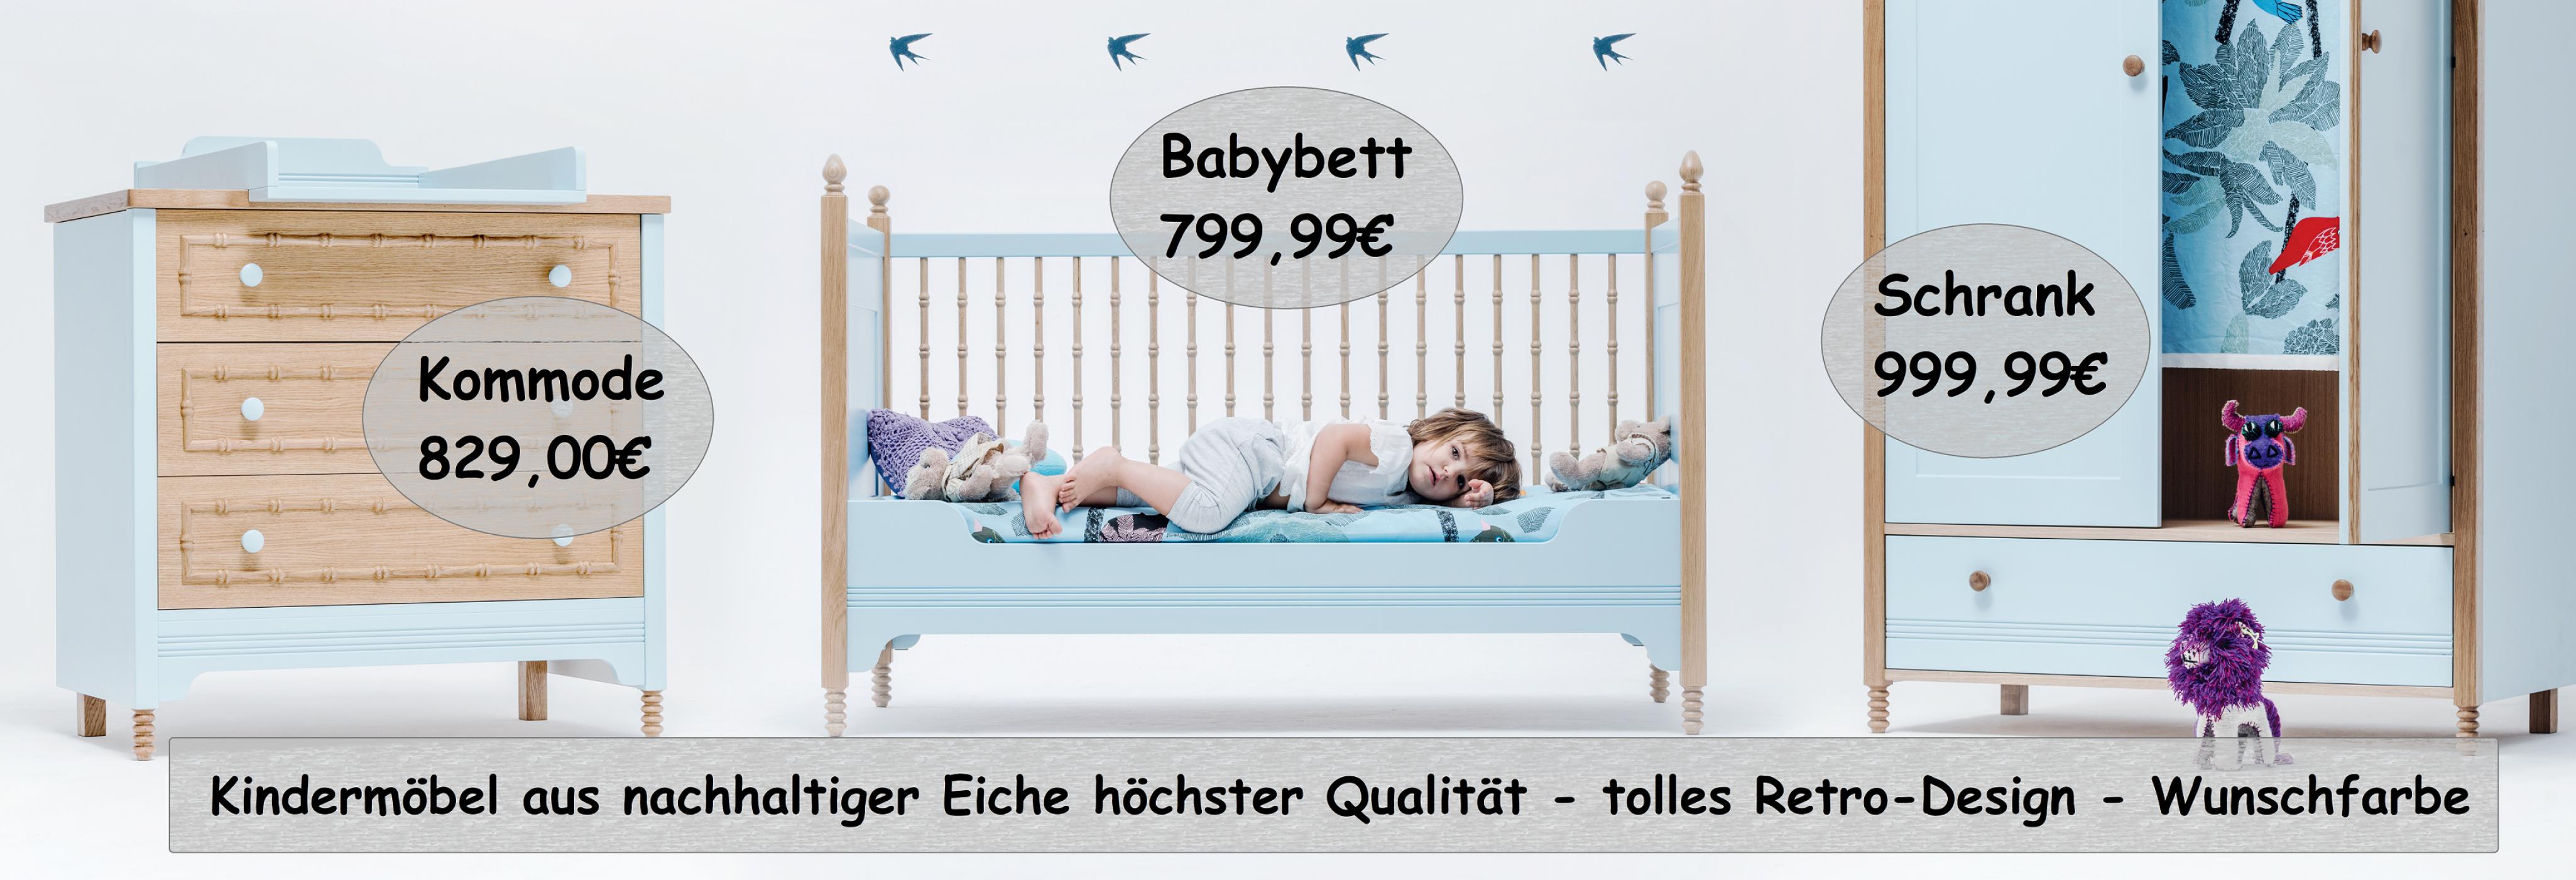 Babyzimmer-Set, Kinderzimmer, Design, Echtholz, Holz, Wunschfarbe